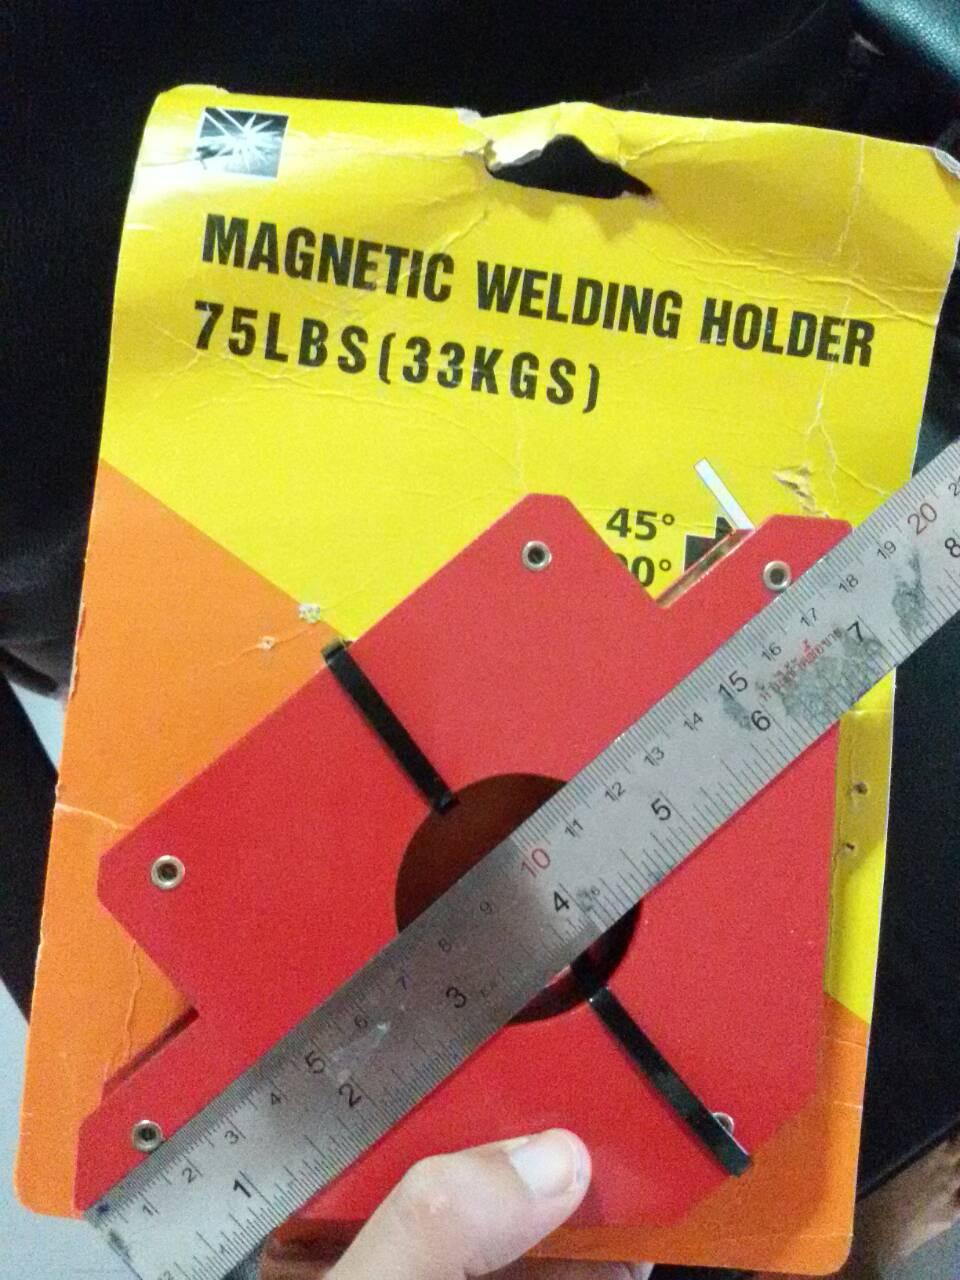 MD03 แม่เหล็กจับงานเชื่อม ขนาด 190*120*26 mm ใหญ่สุด